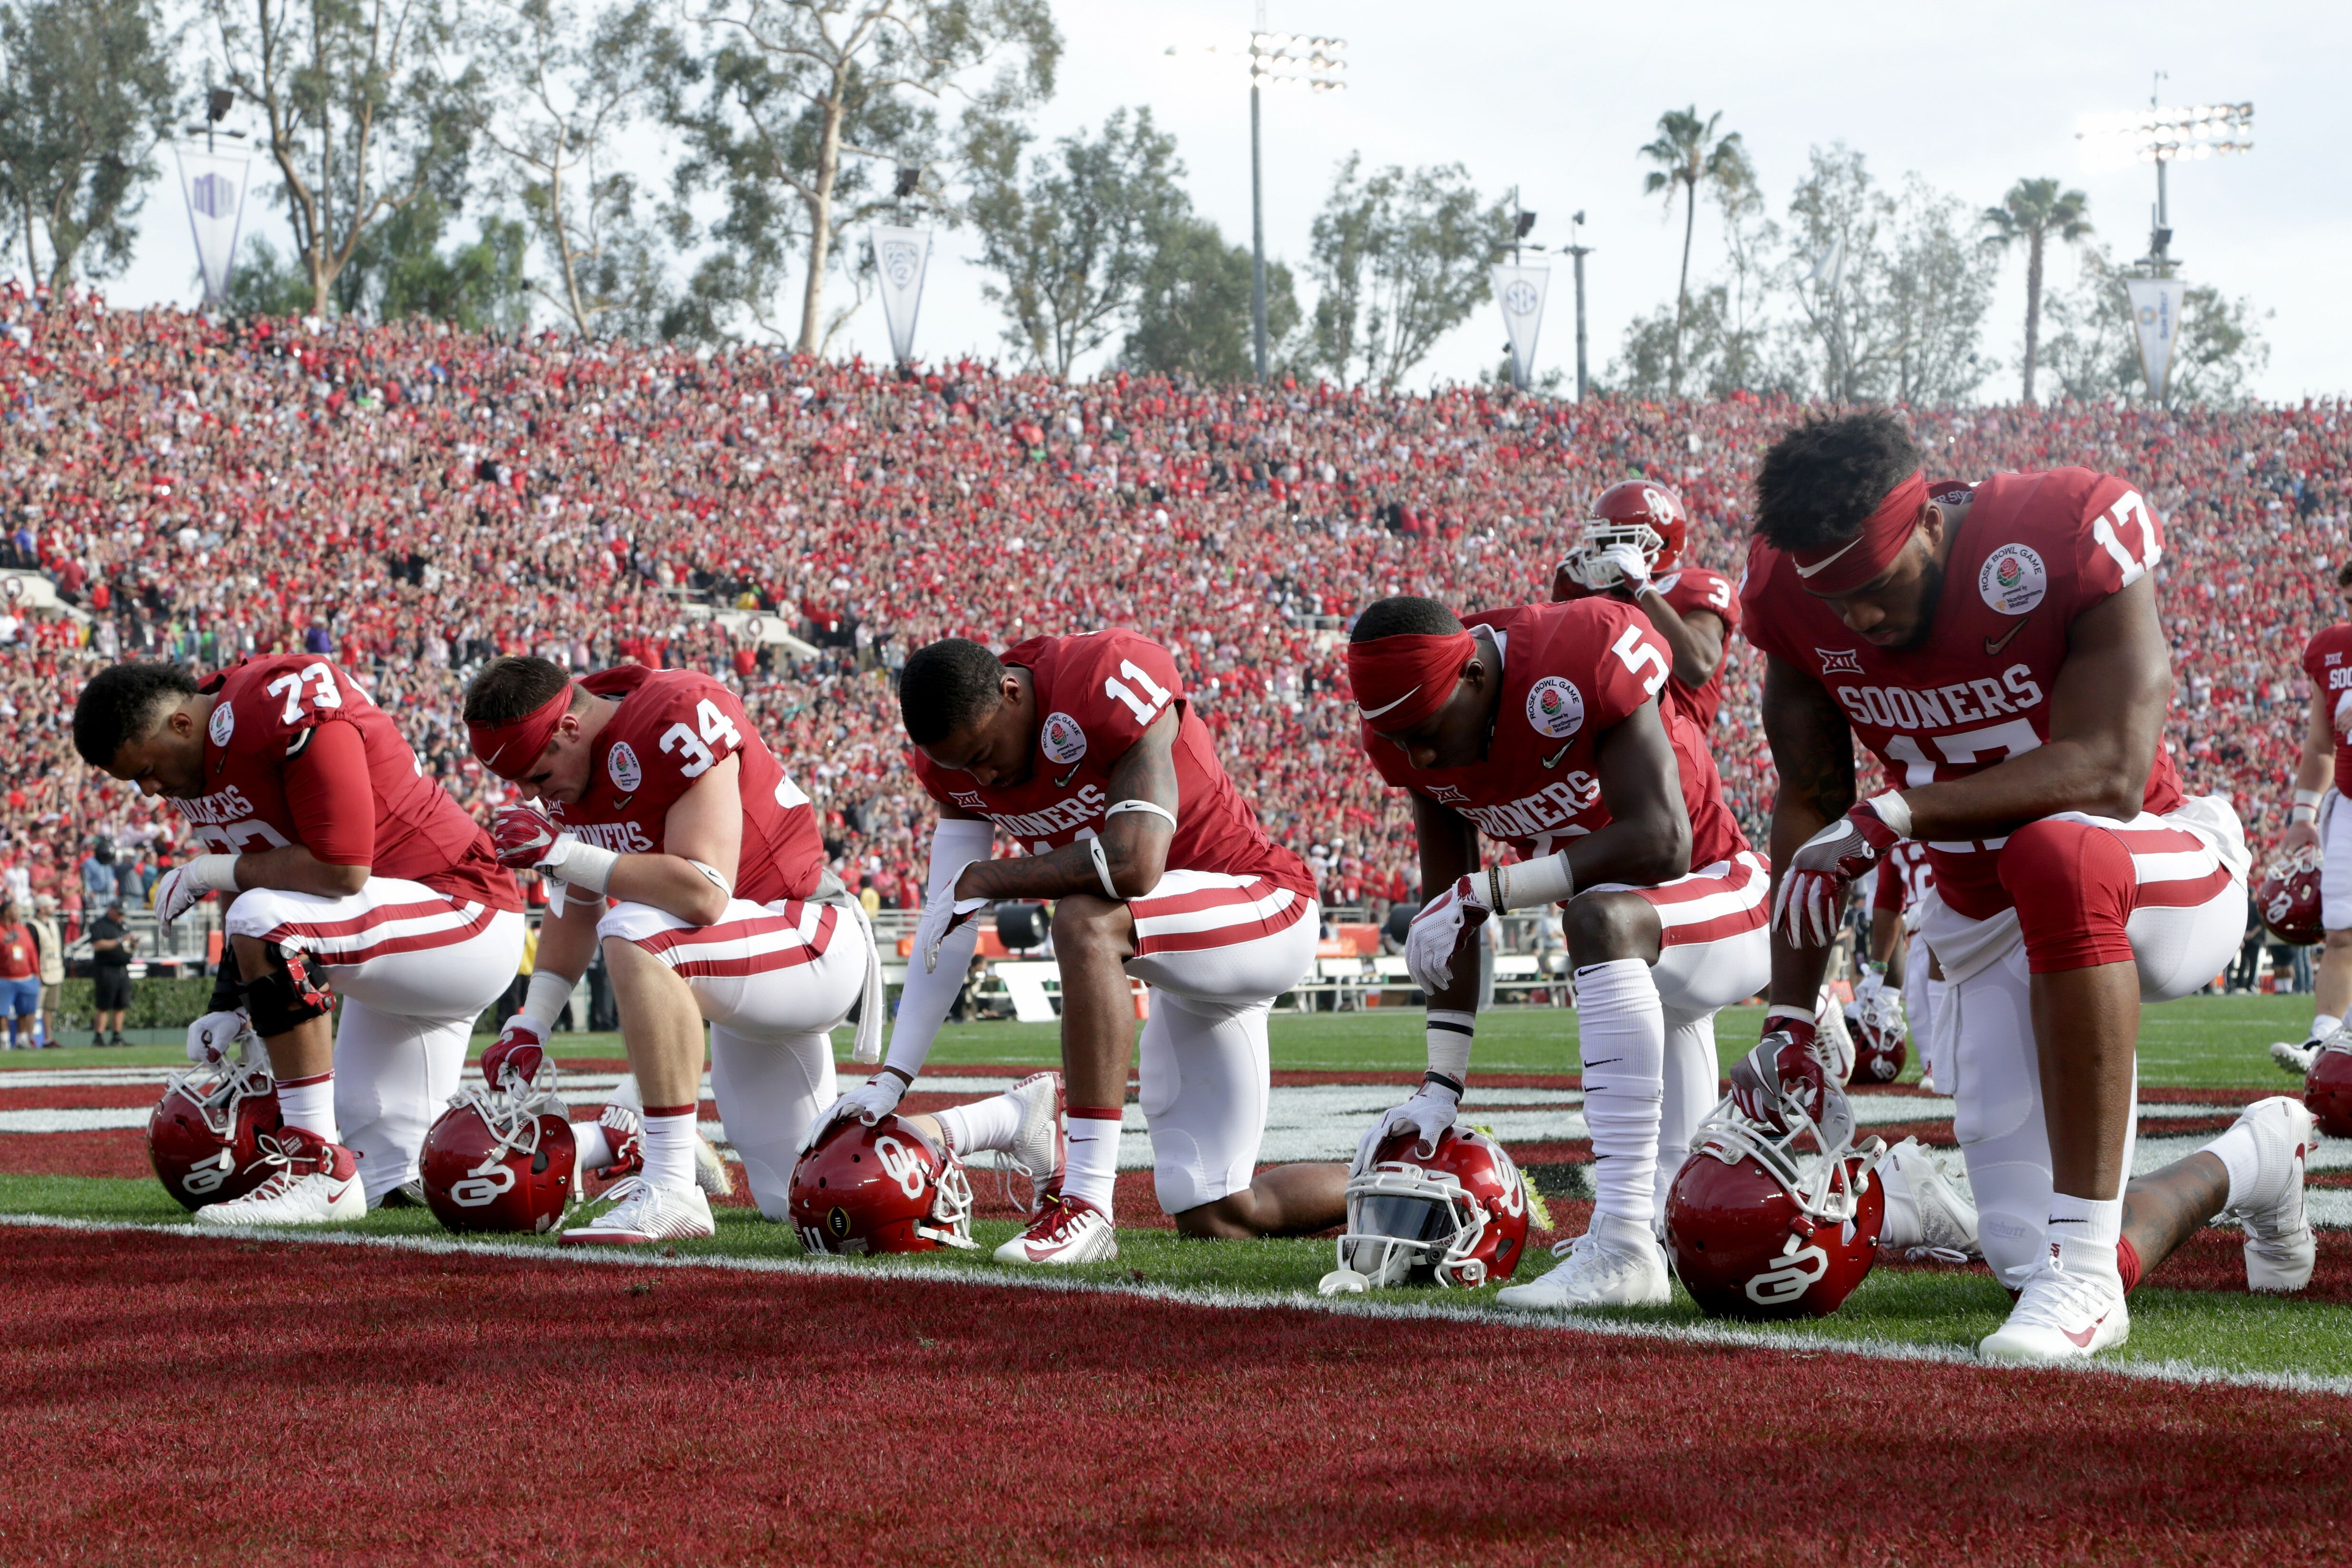 Oklahoma football: Former Sooner assistant Jim Dickey dies